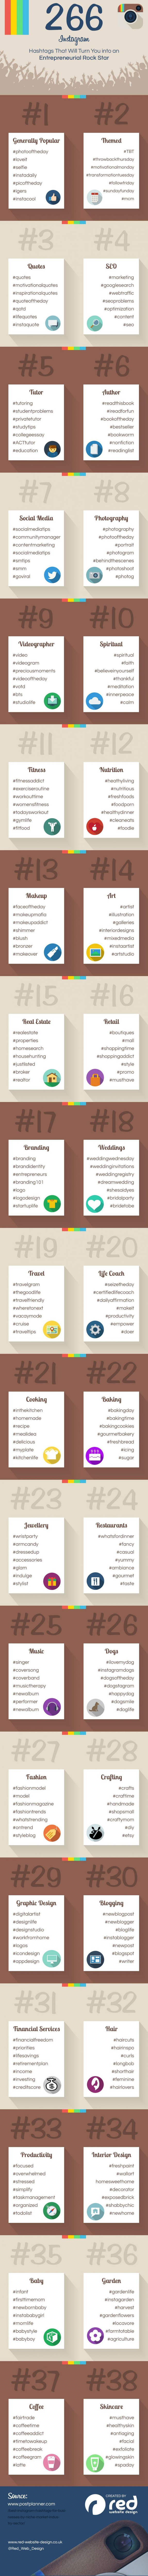 hashtags instagram bereik infographic